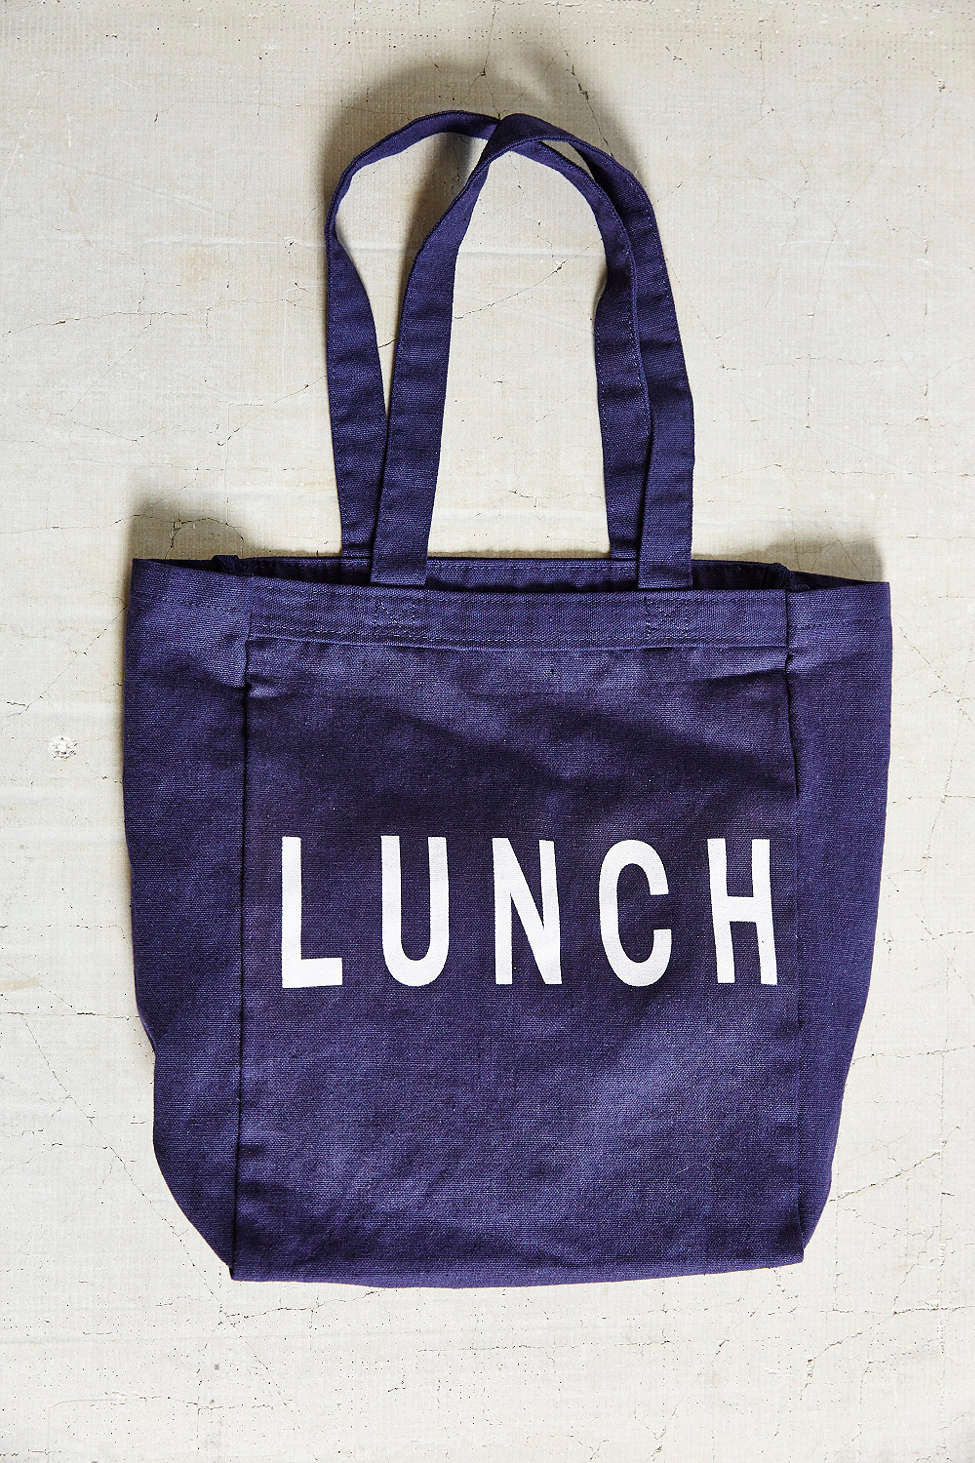 lunch tote.jpg